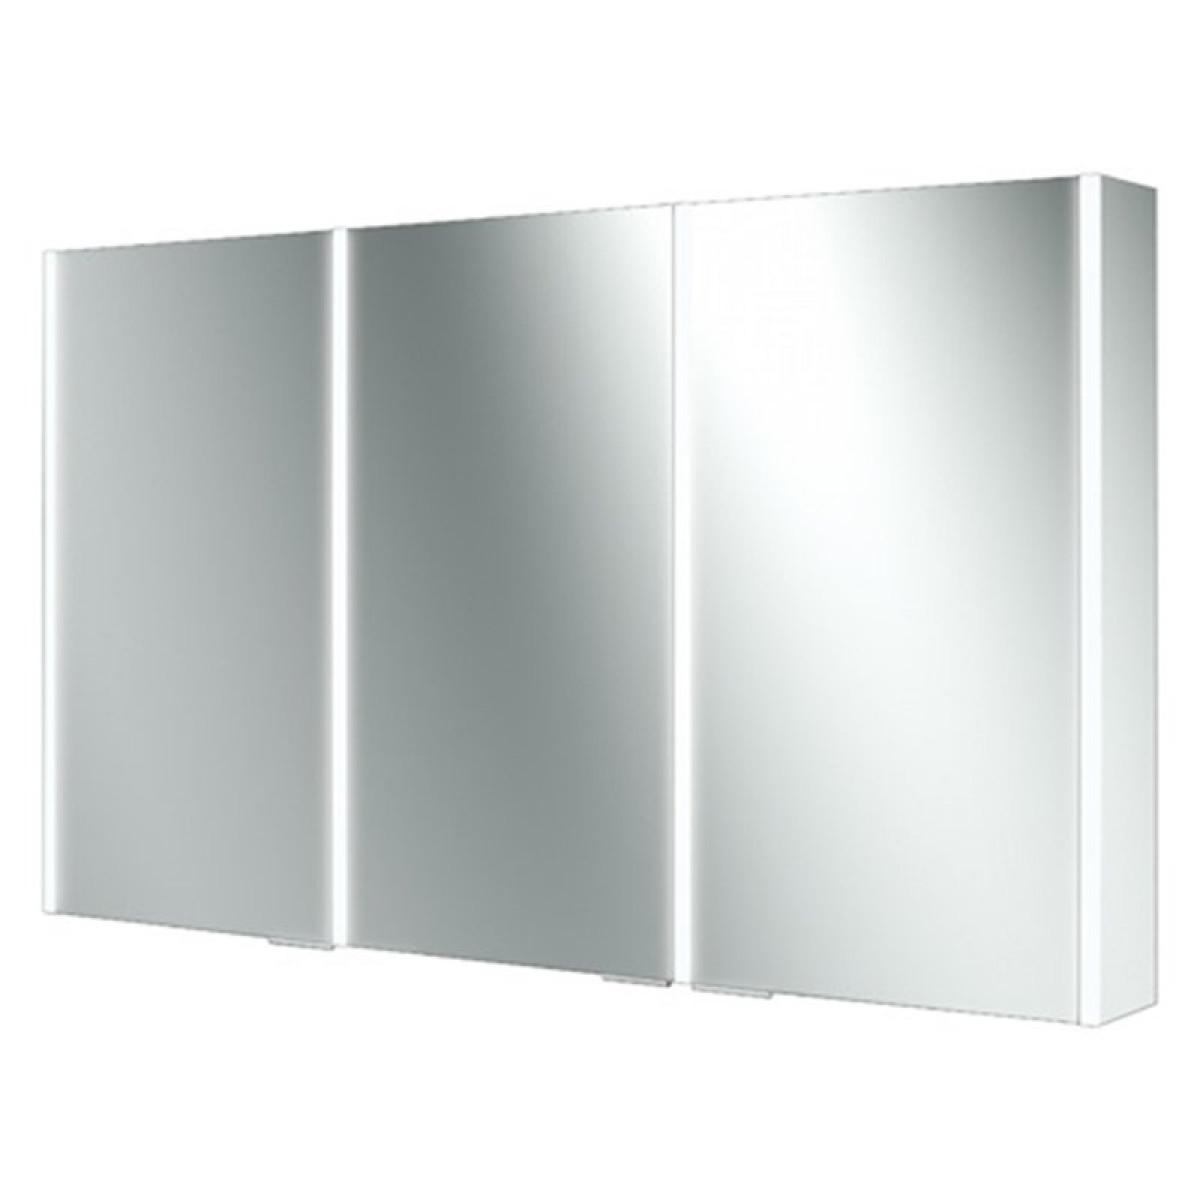 HIB Xenon 120 LED Aluminium Illuminated Bathroom Cabinet ...